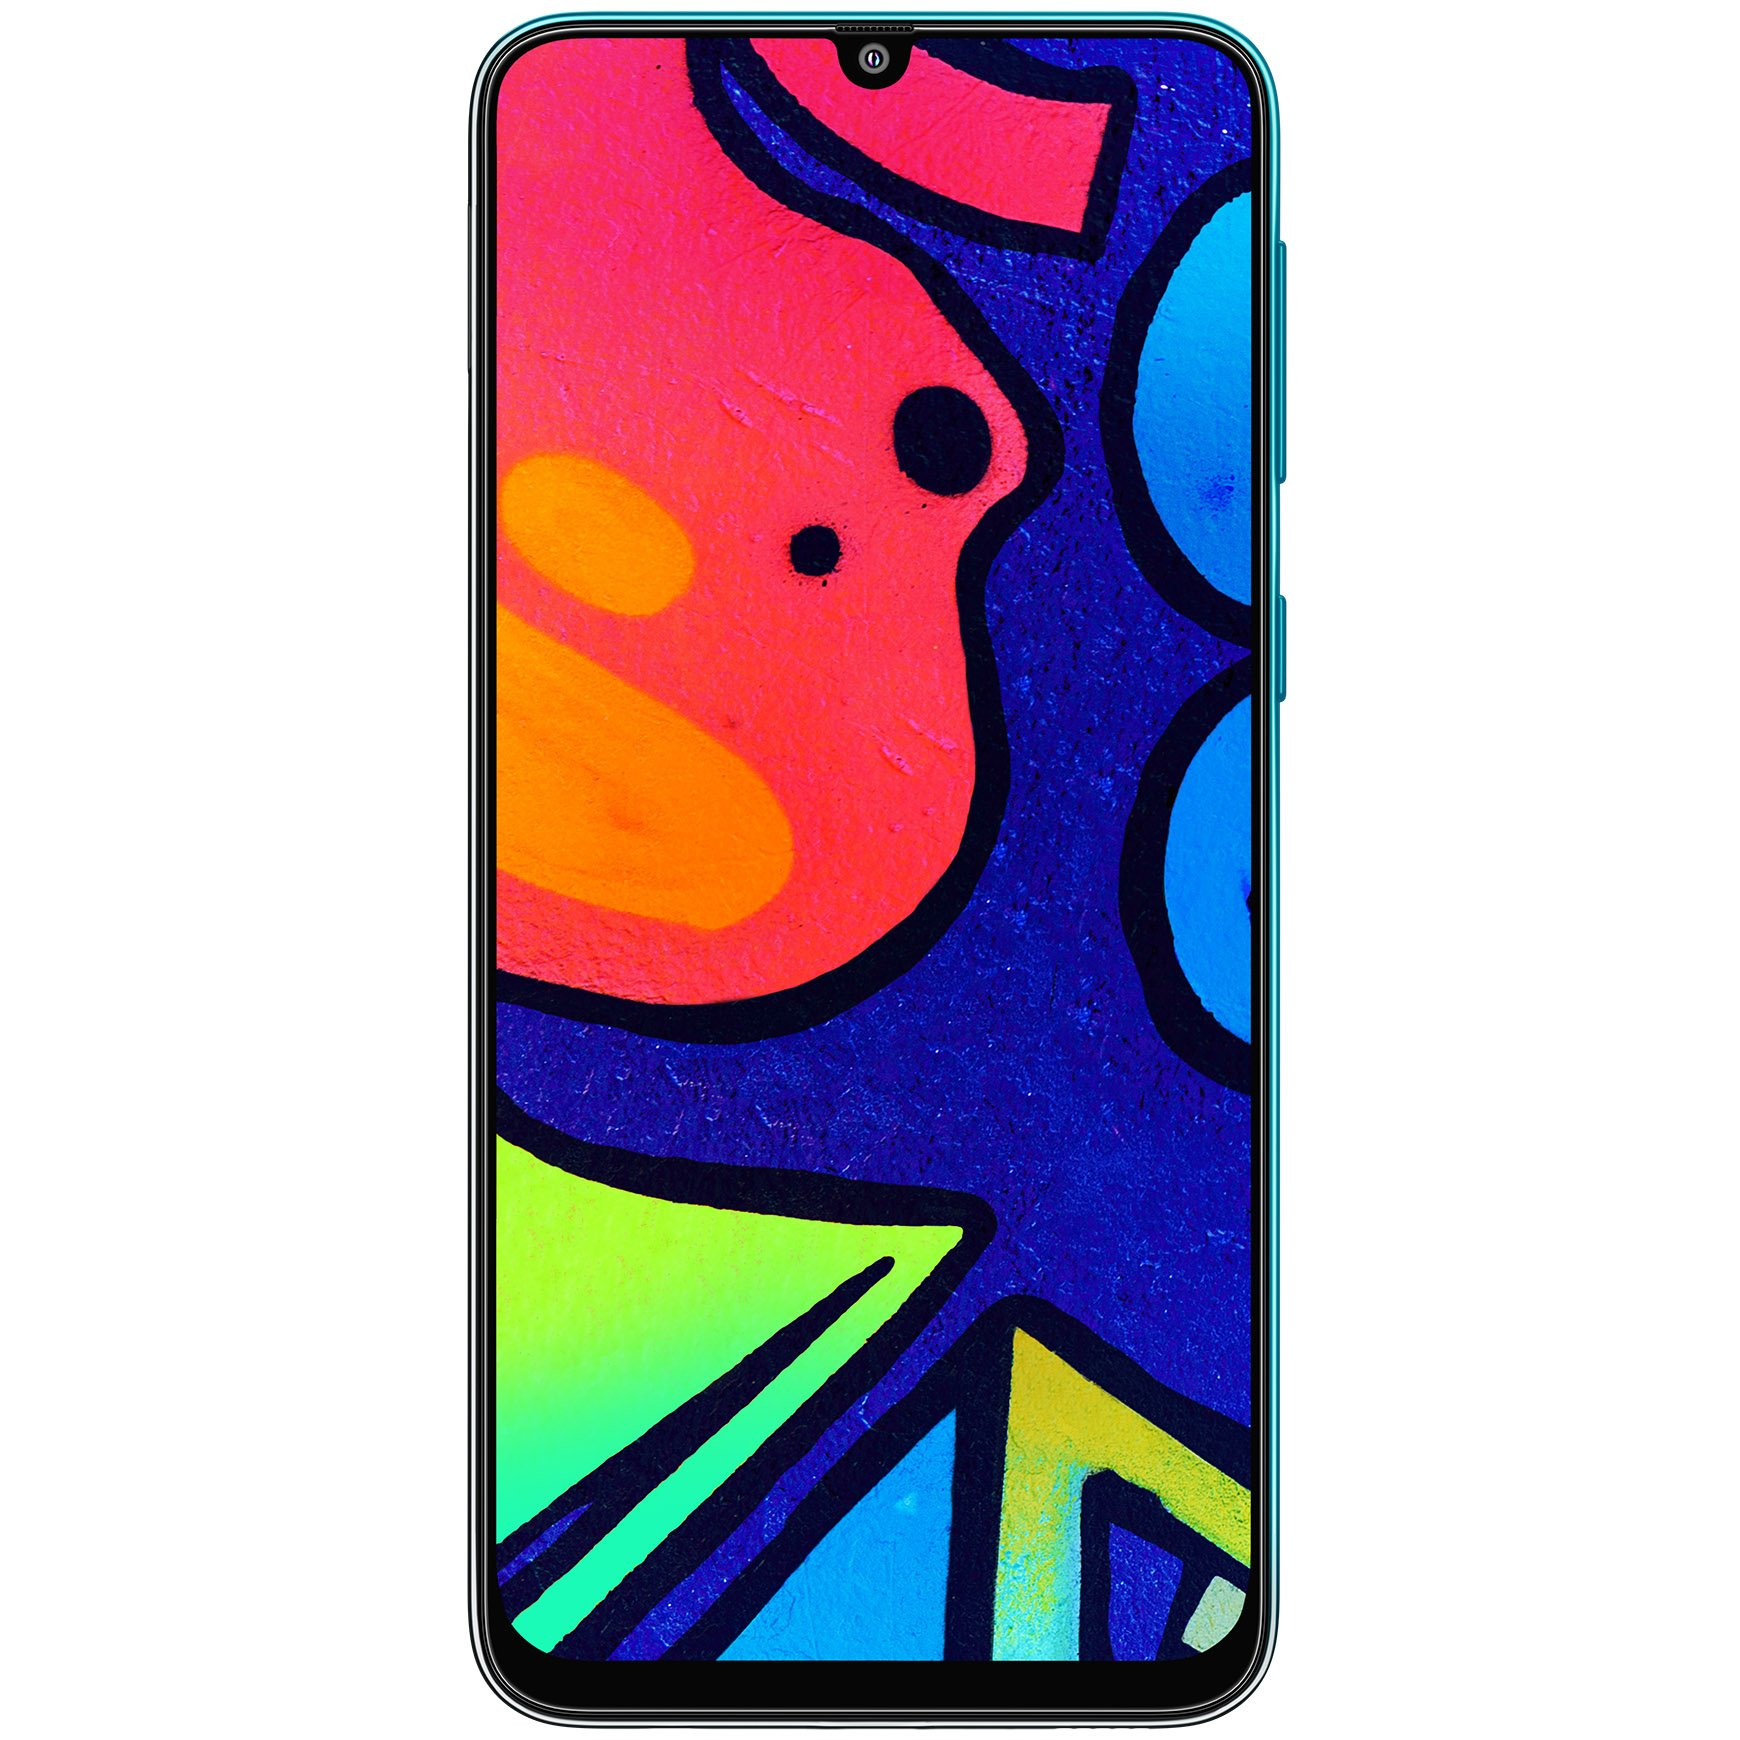 Telefon mobil Samsung Galaxy F41, Dual SIM, 128GB, 6GB RAM, 4G, Fusion Green